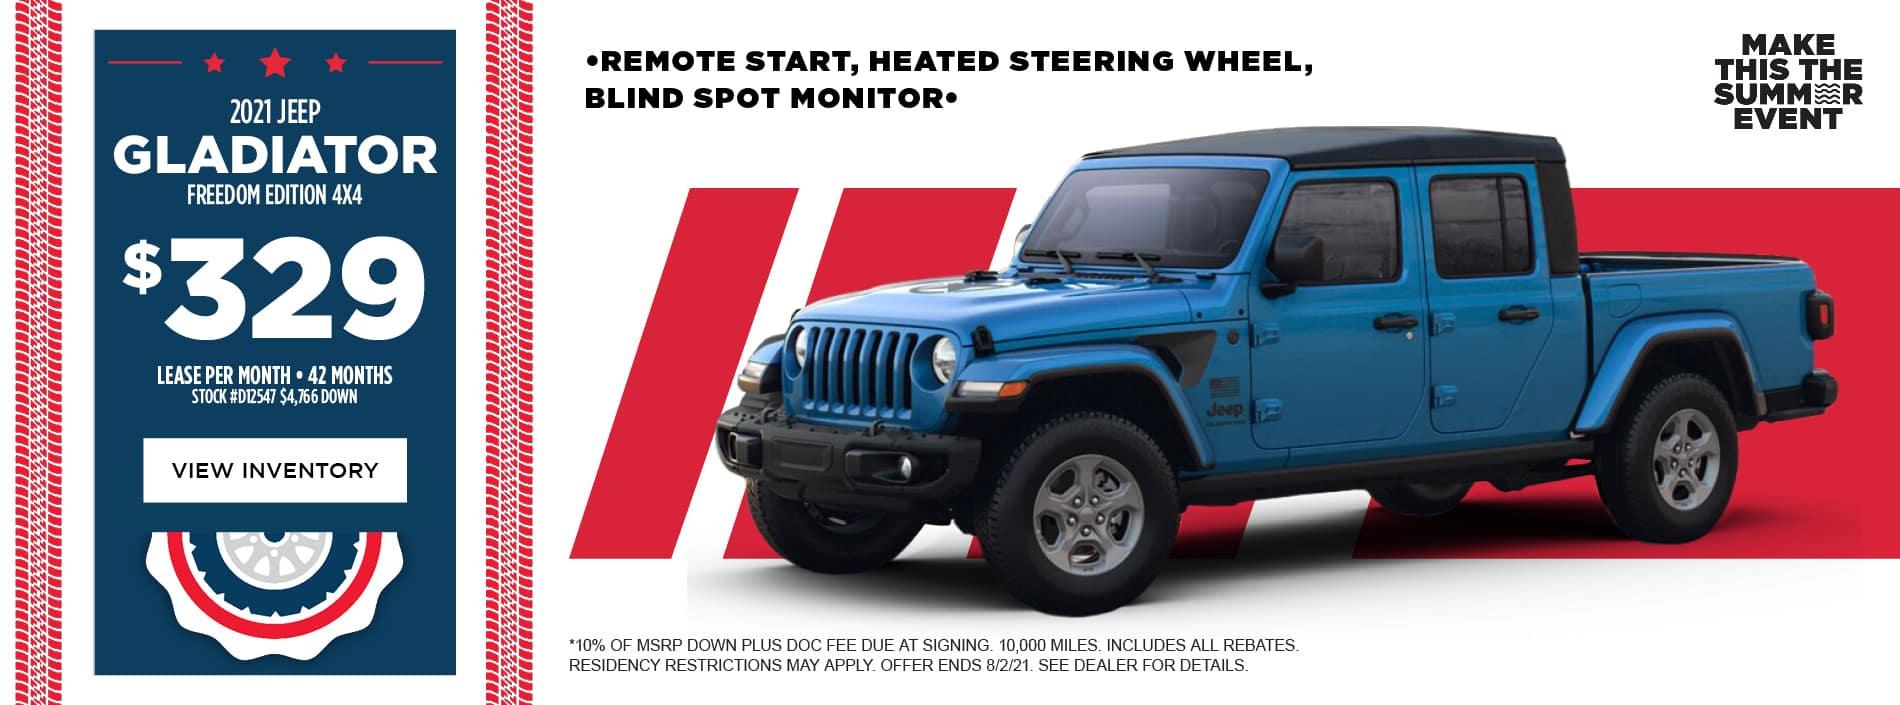 2021 Jeep Gladiator Freedom Edition 4x4